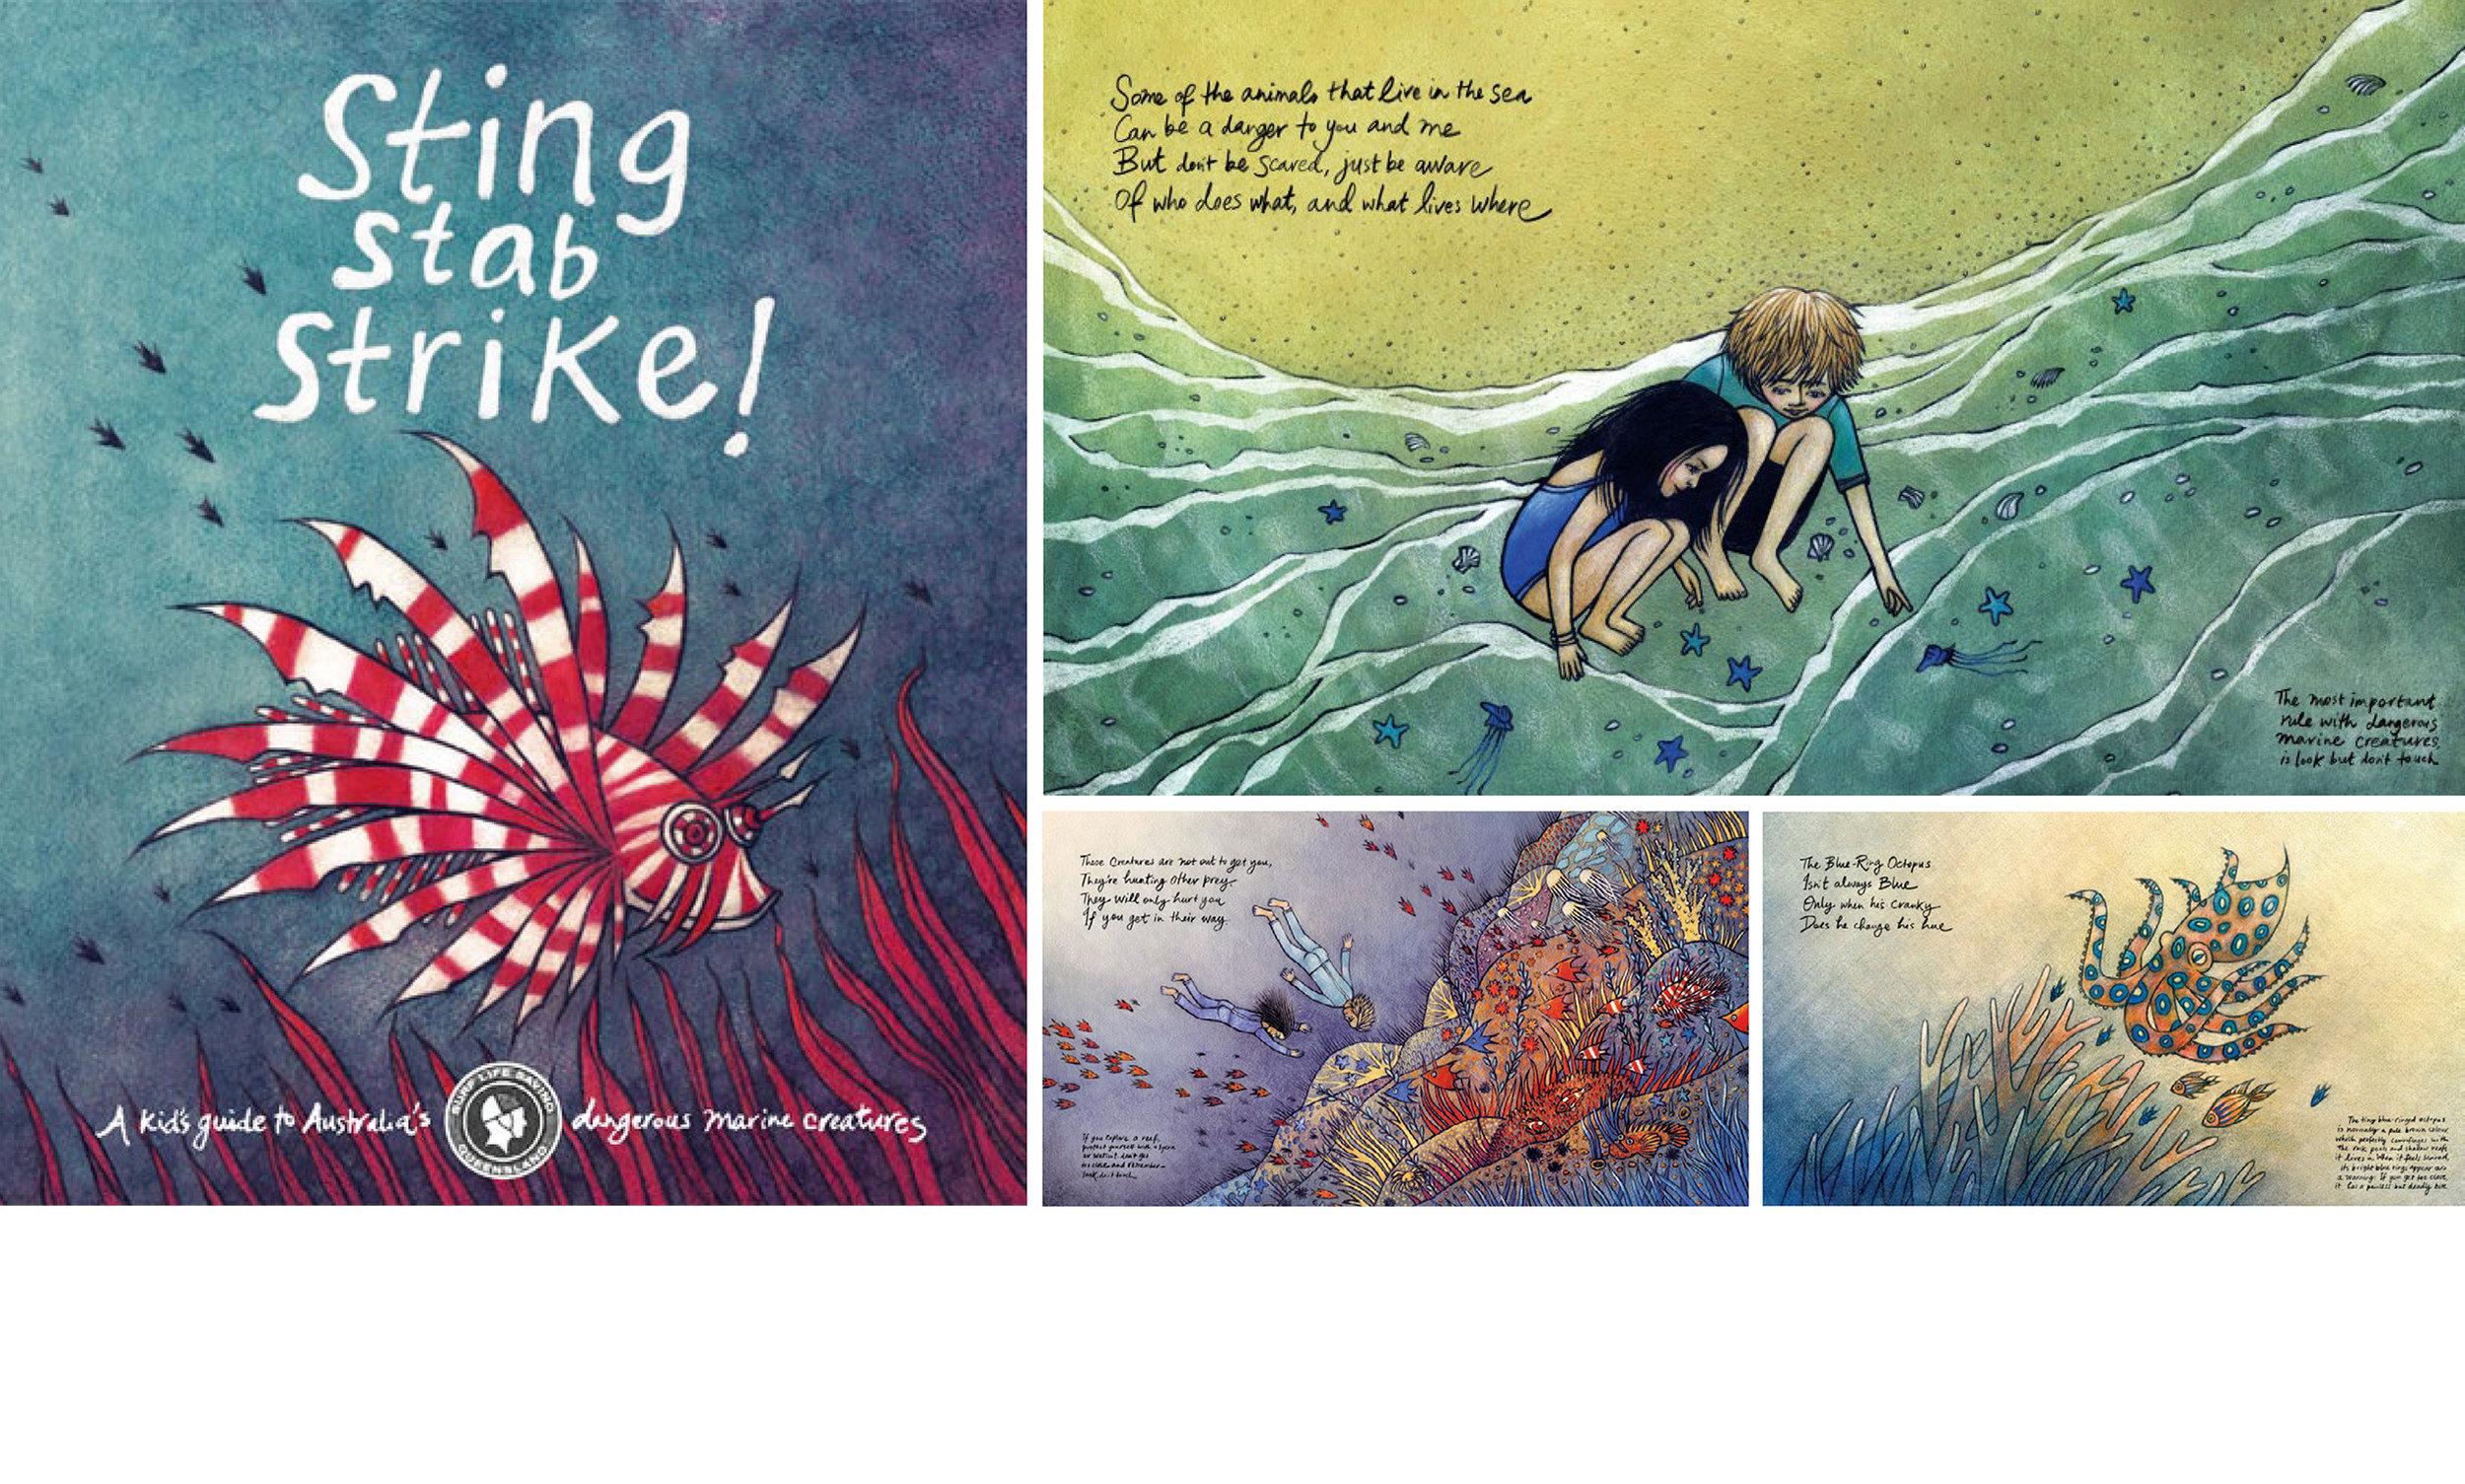 STING STAB STRIKE     Illustrated children's book by Heidi Green